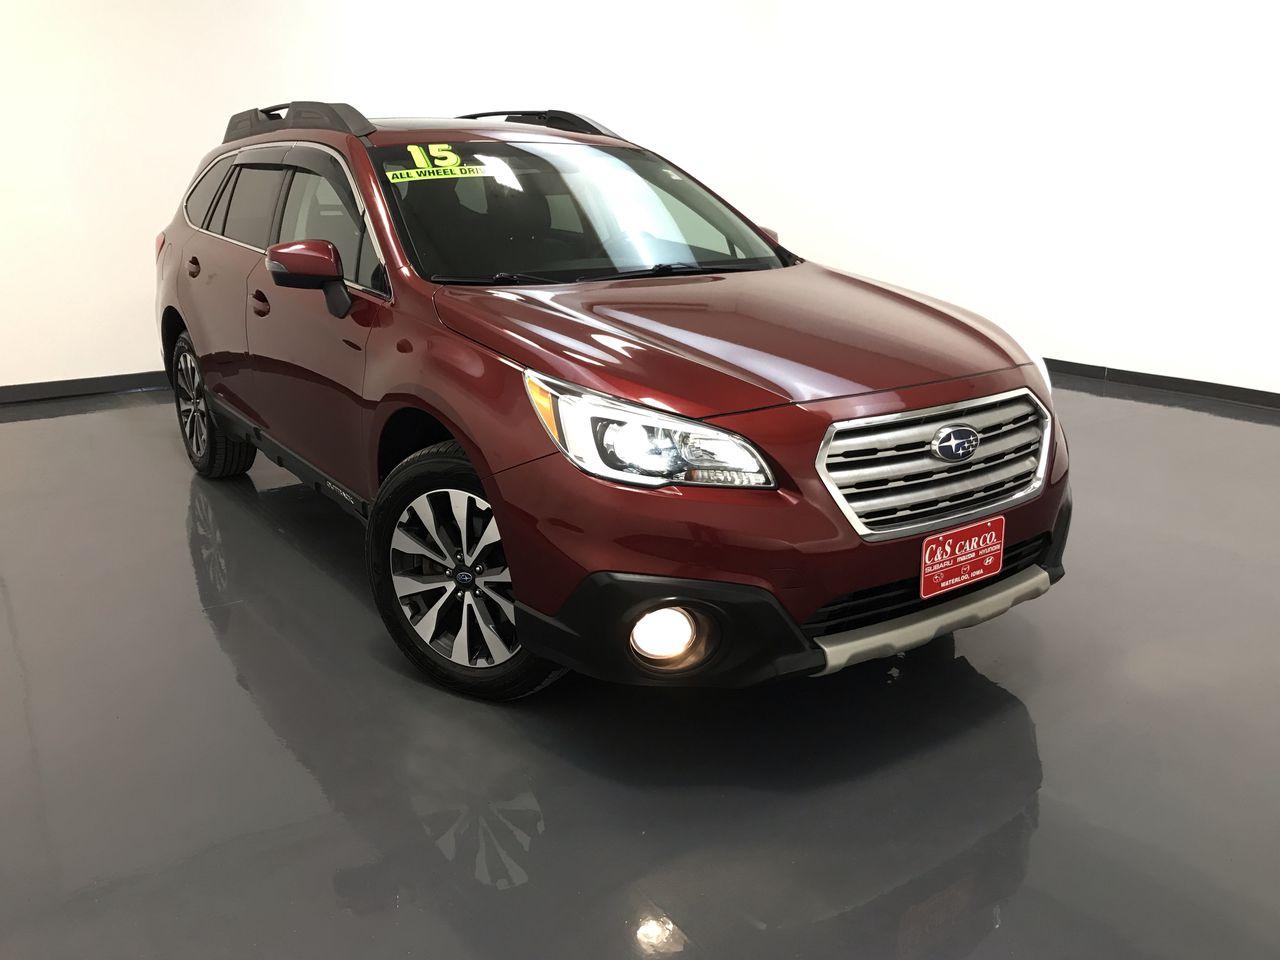 2015 Subaru Outback 3.6R Limited  - 15878  - C & S Car Company